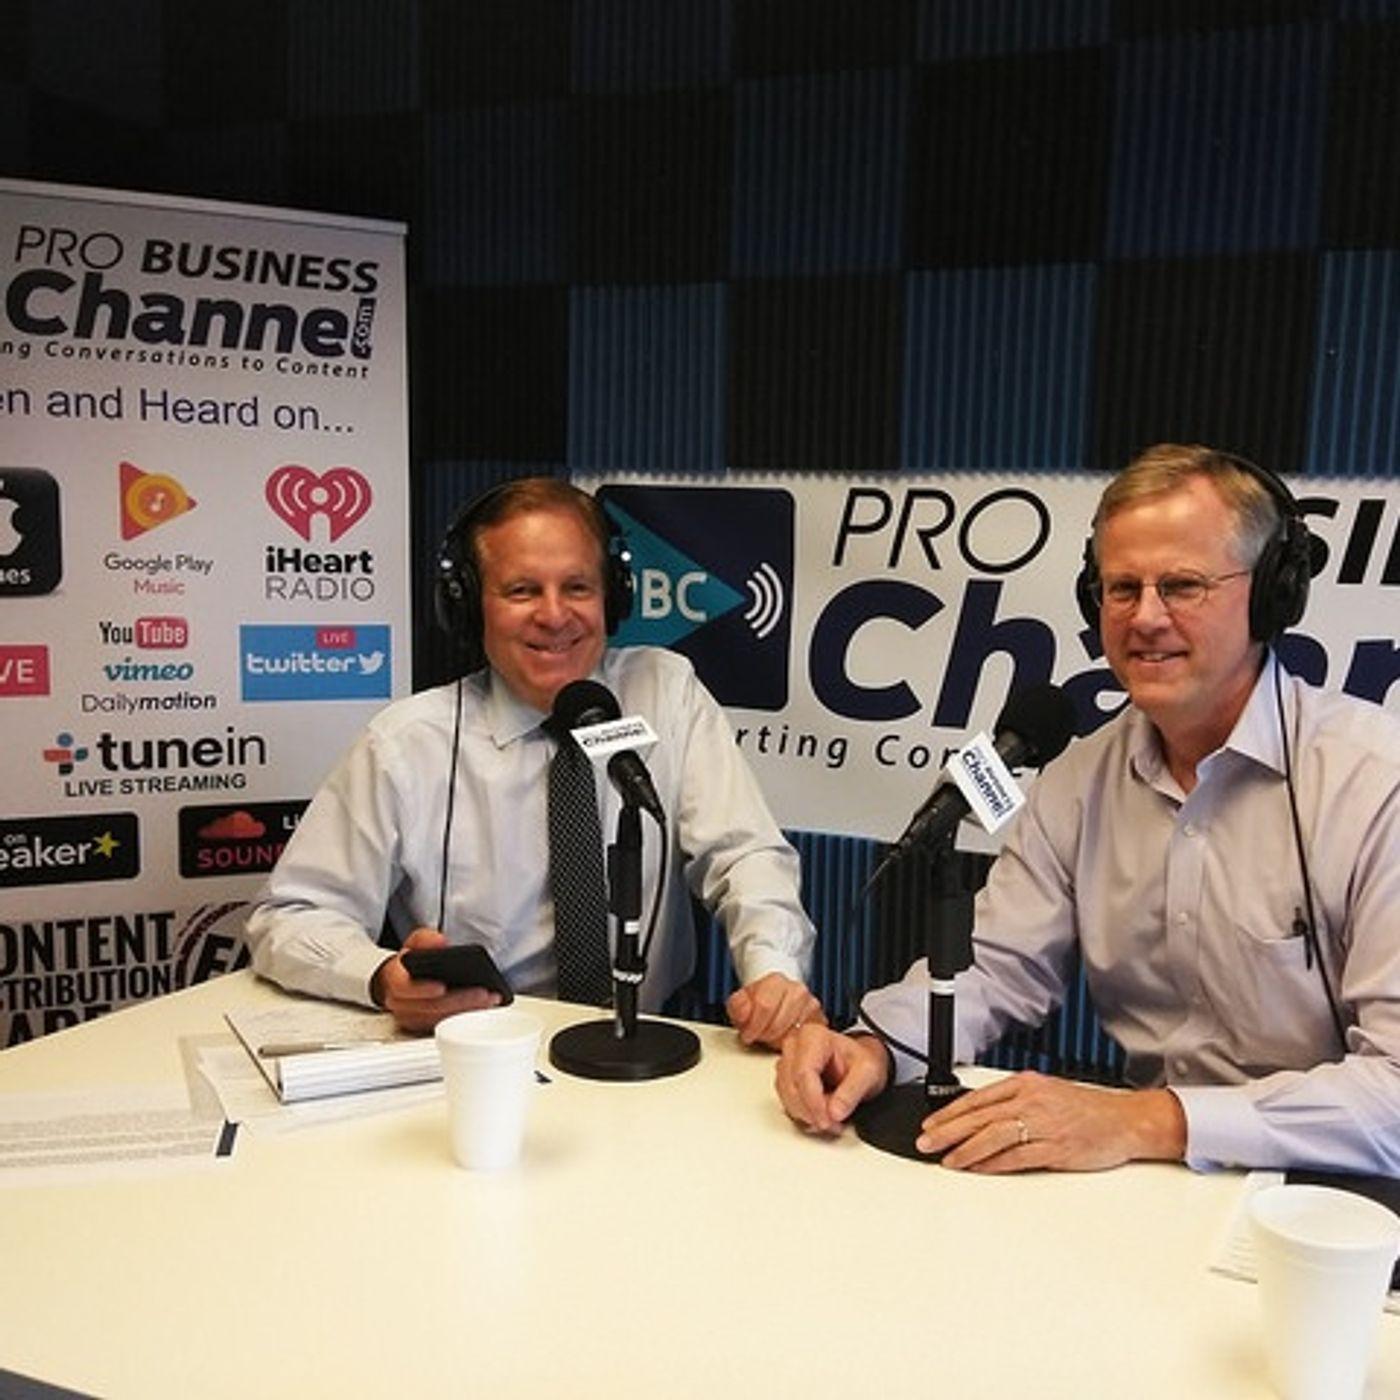 Institutional Executive to Growth Entrepreneur John Coffin Interview on Capital Club Radio